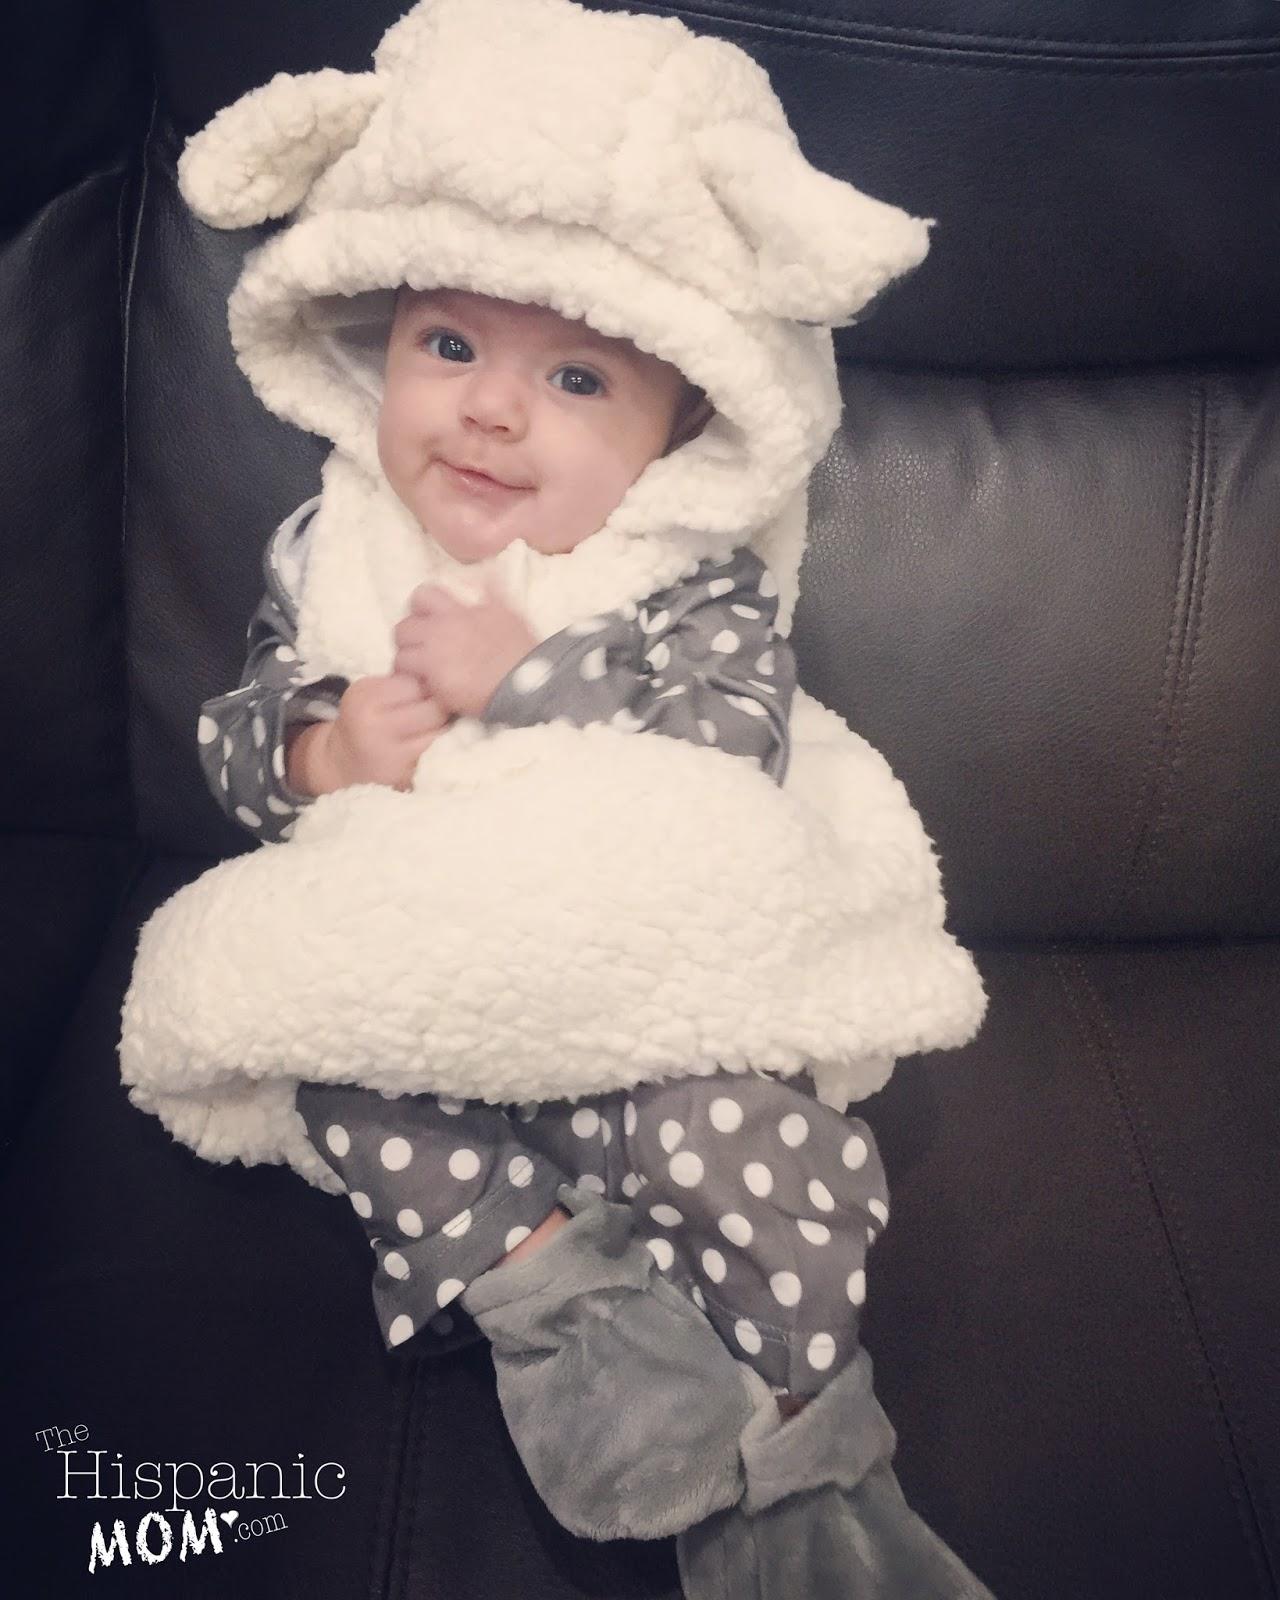 f3c8e348b Target Infant Halloween Costumes   Clothing 11 Phenomenal Target ...